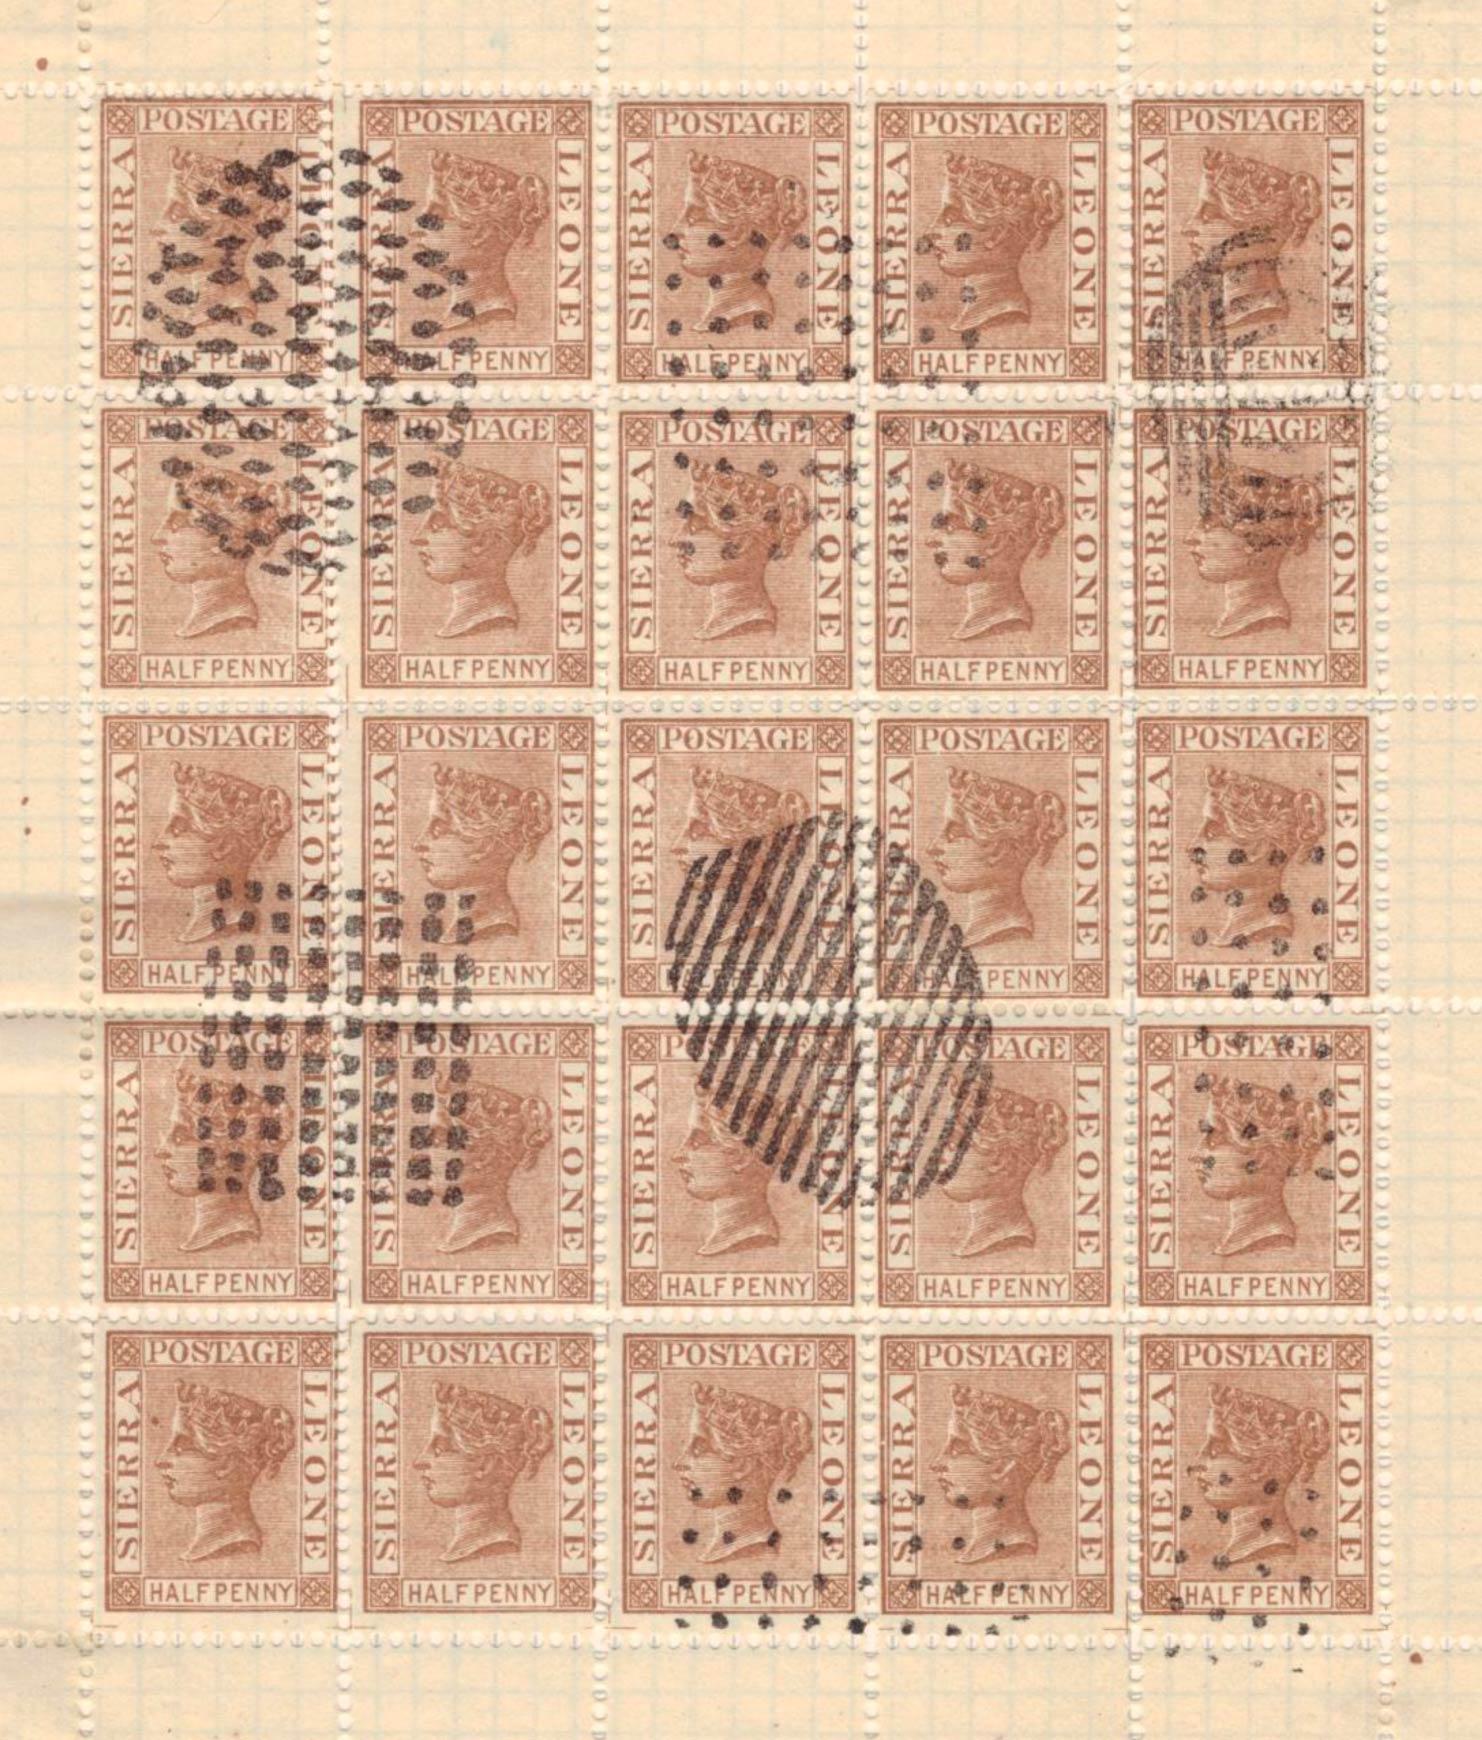 Sierra_Leone_QV_half-p_Spiro-sheet_Forgery